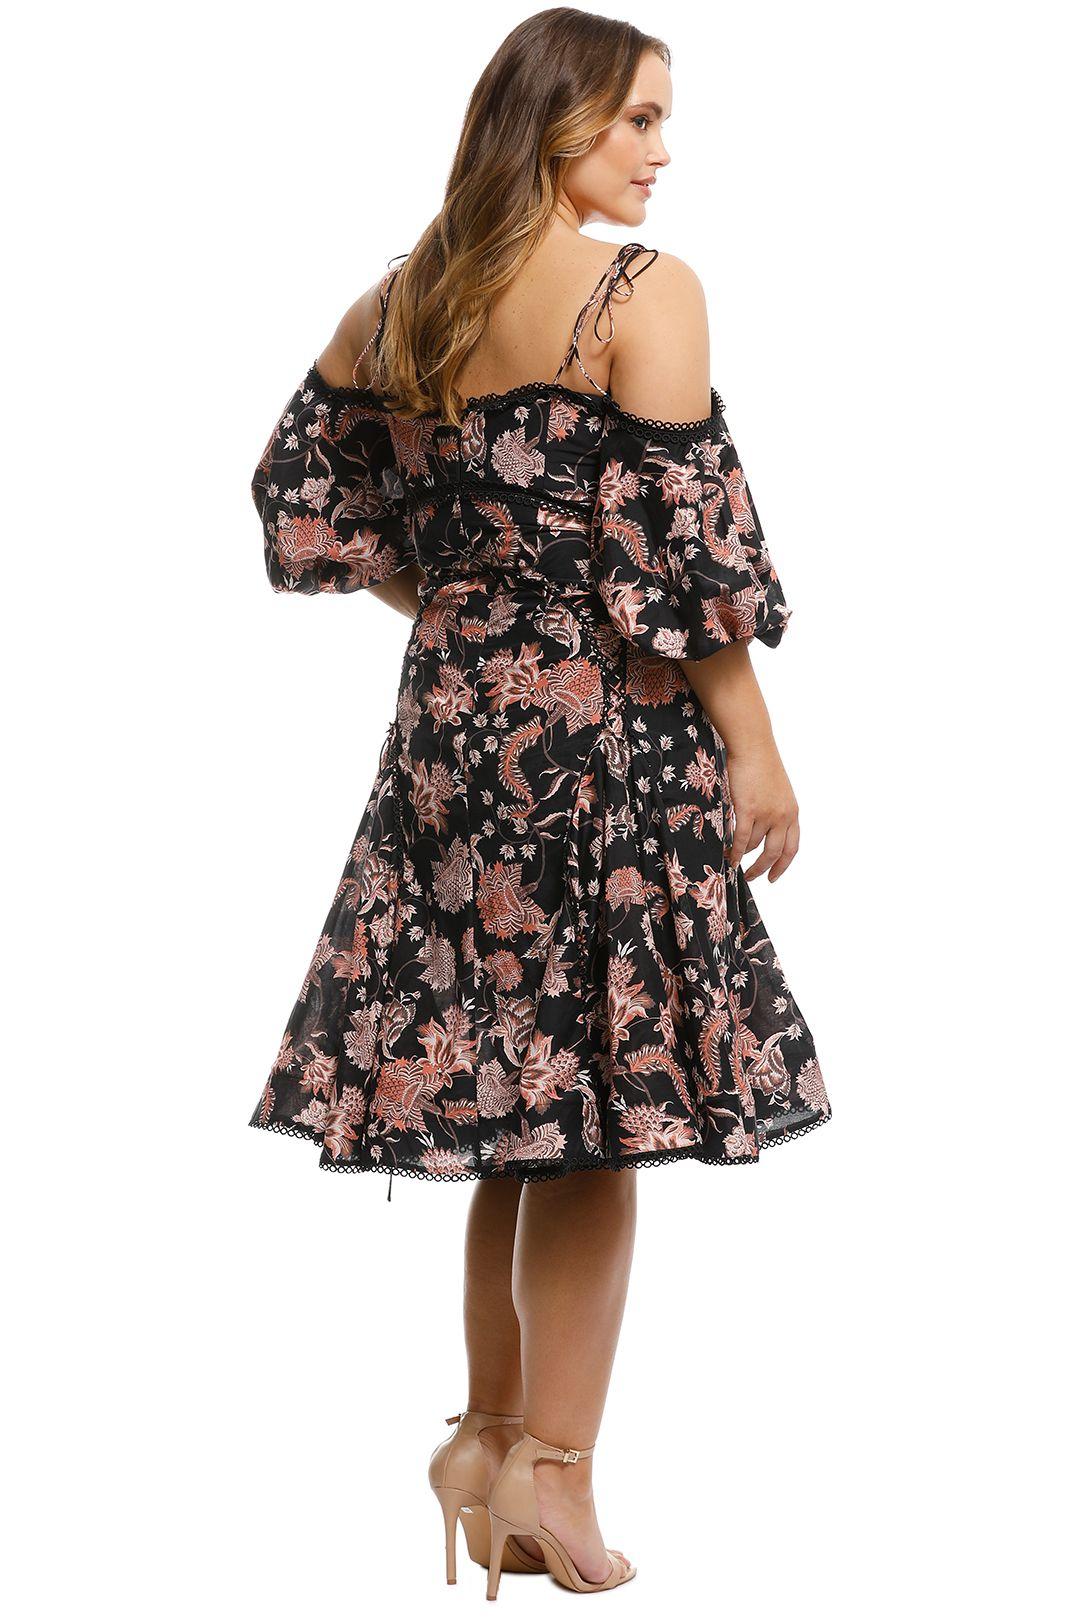 Thurley - Pineapple Chintz Lace Up Midi Dress - Print - Back